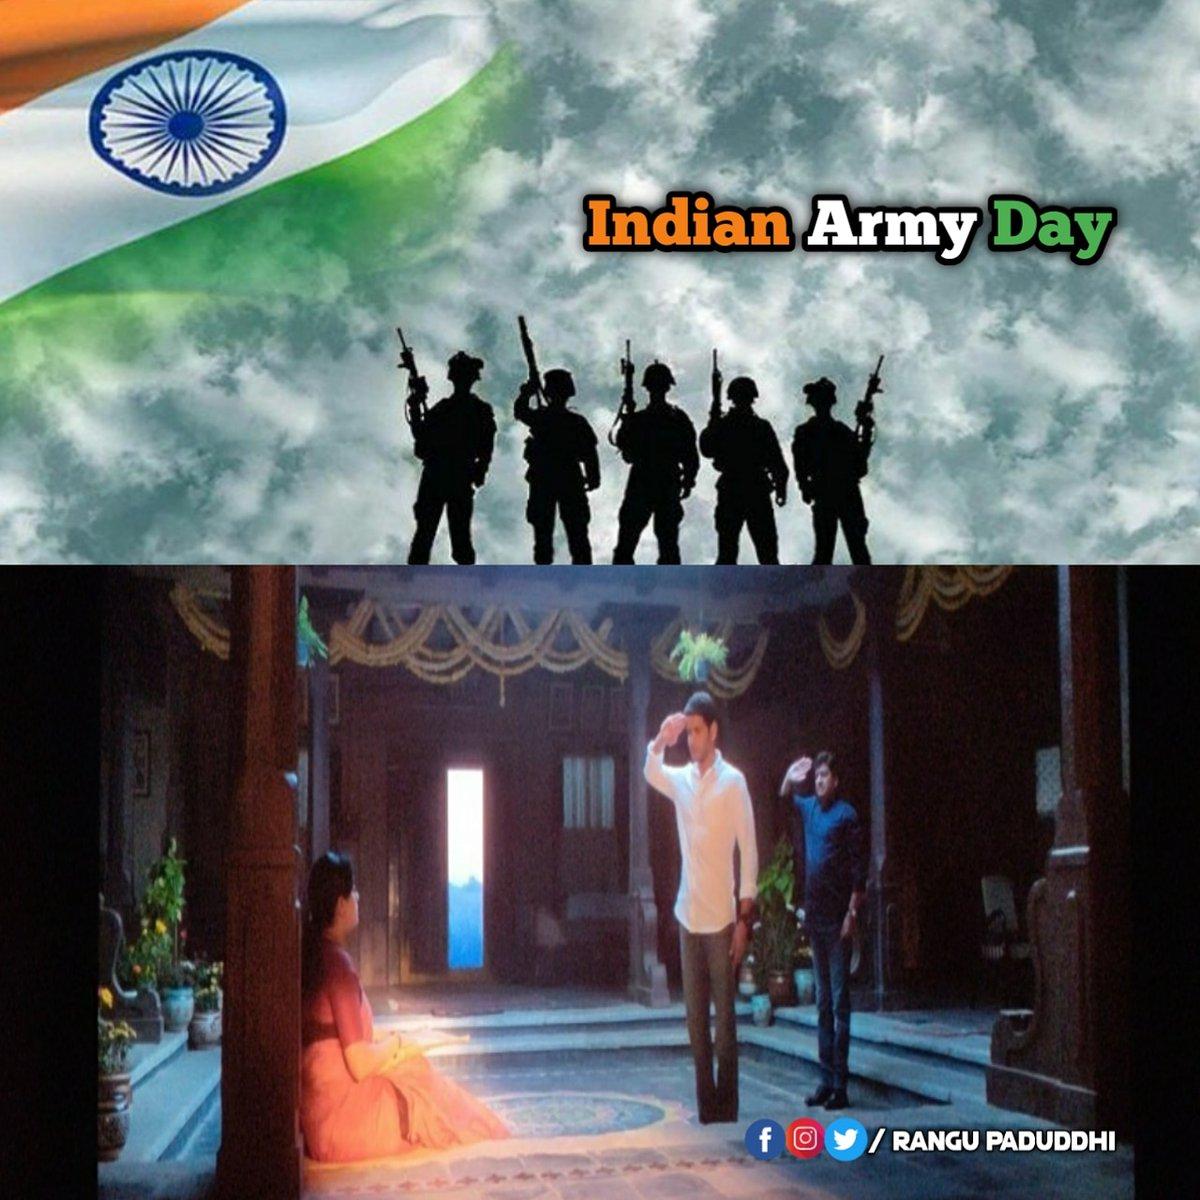 INDIAN ARMY DAY  Do follow - @rangu_paduddhi #rangupaduddhi #comedy #fun #memes #memesdaily #telugumemes #telugumeme  #IndianArmy #Indiapic.twitter.com/T4hngPttY1